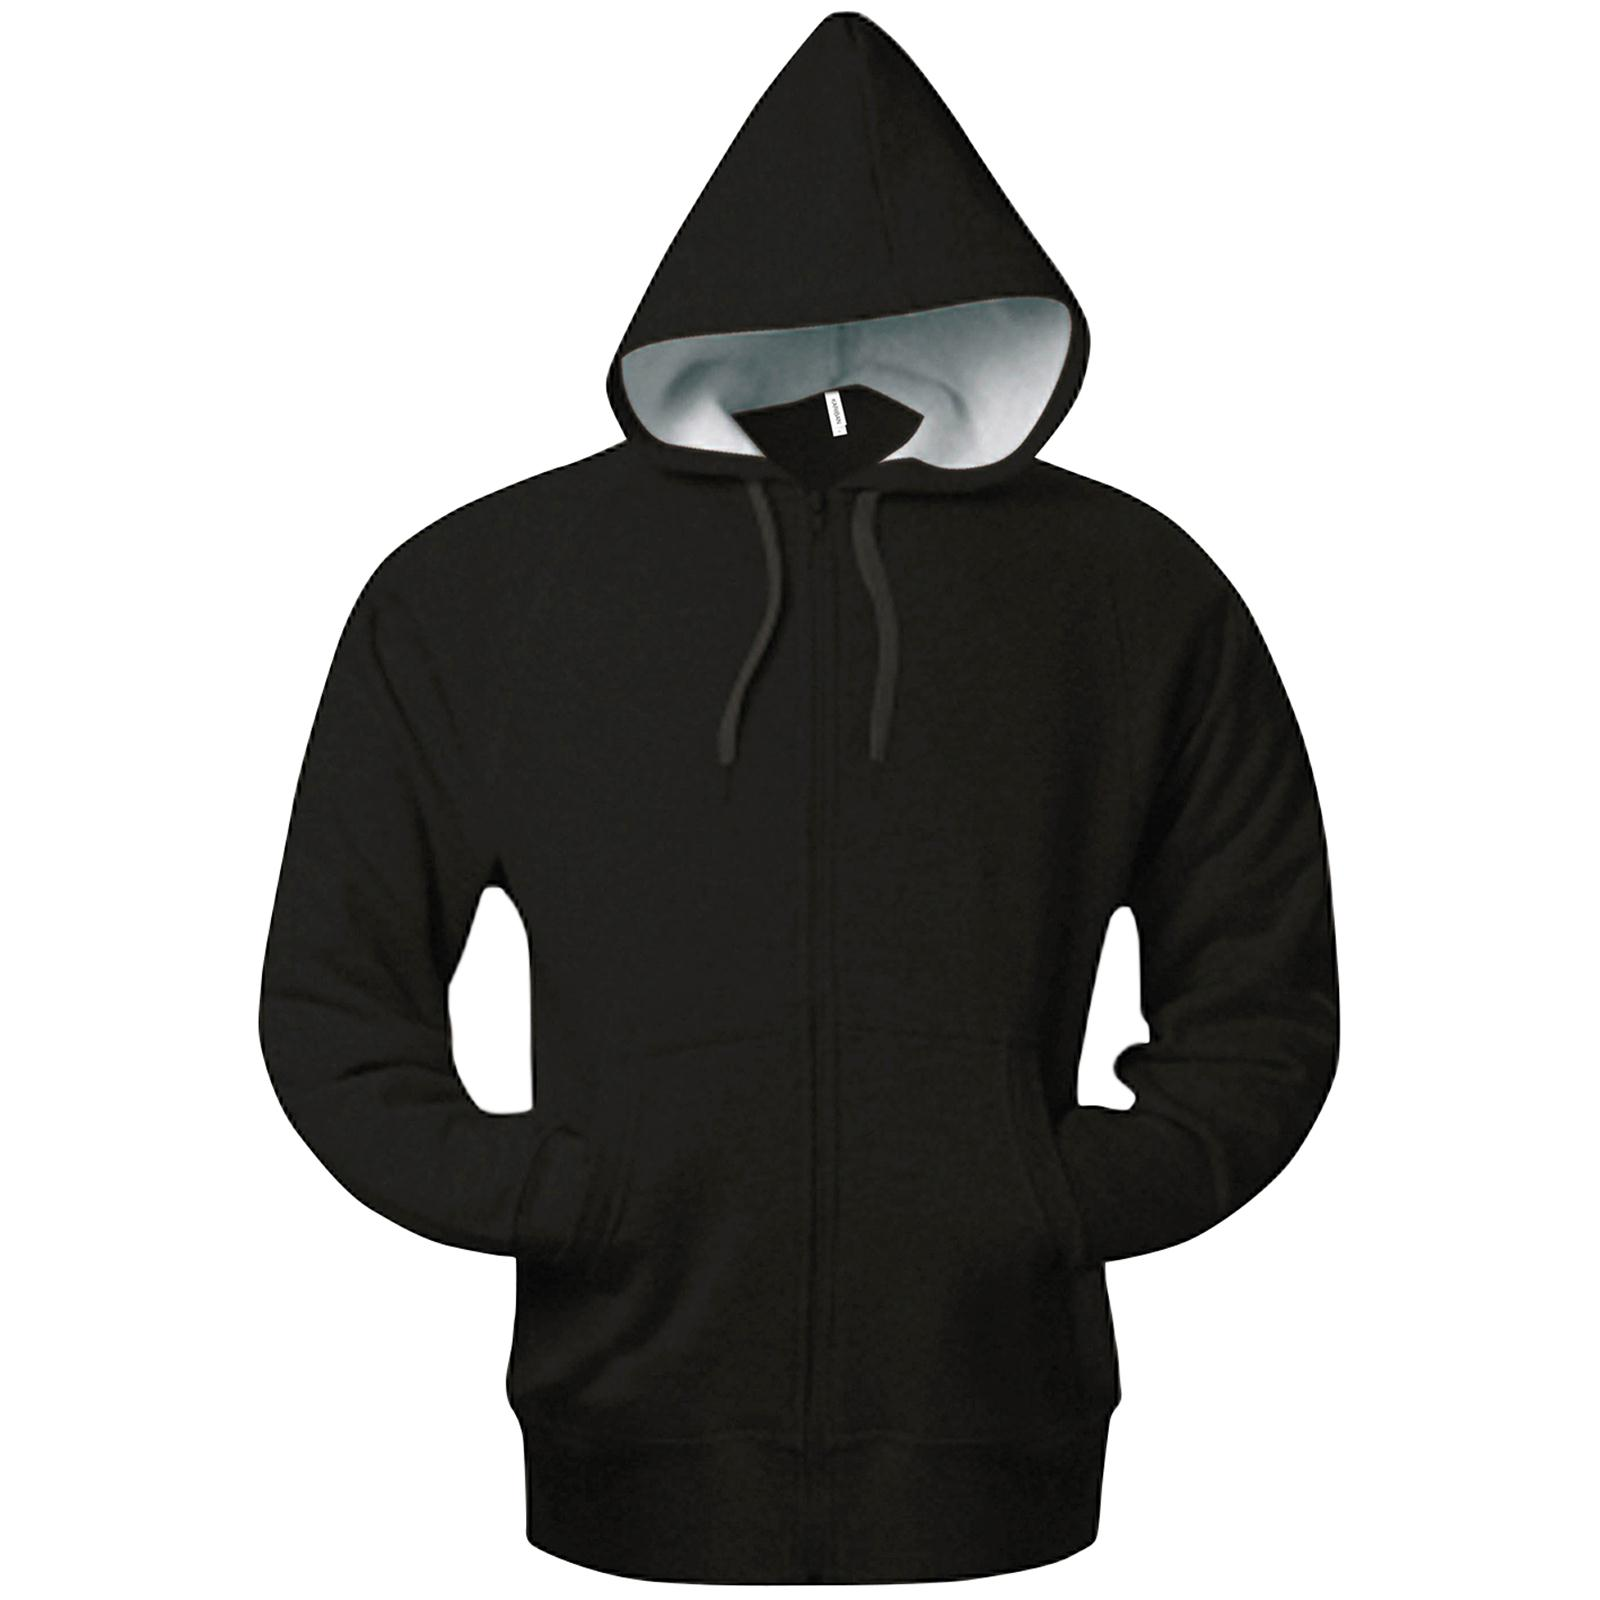 New KARIBAN Mens Heavy Zip Up Contrast Hoodie Sweatshirt Jacket 6